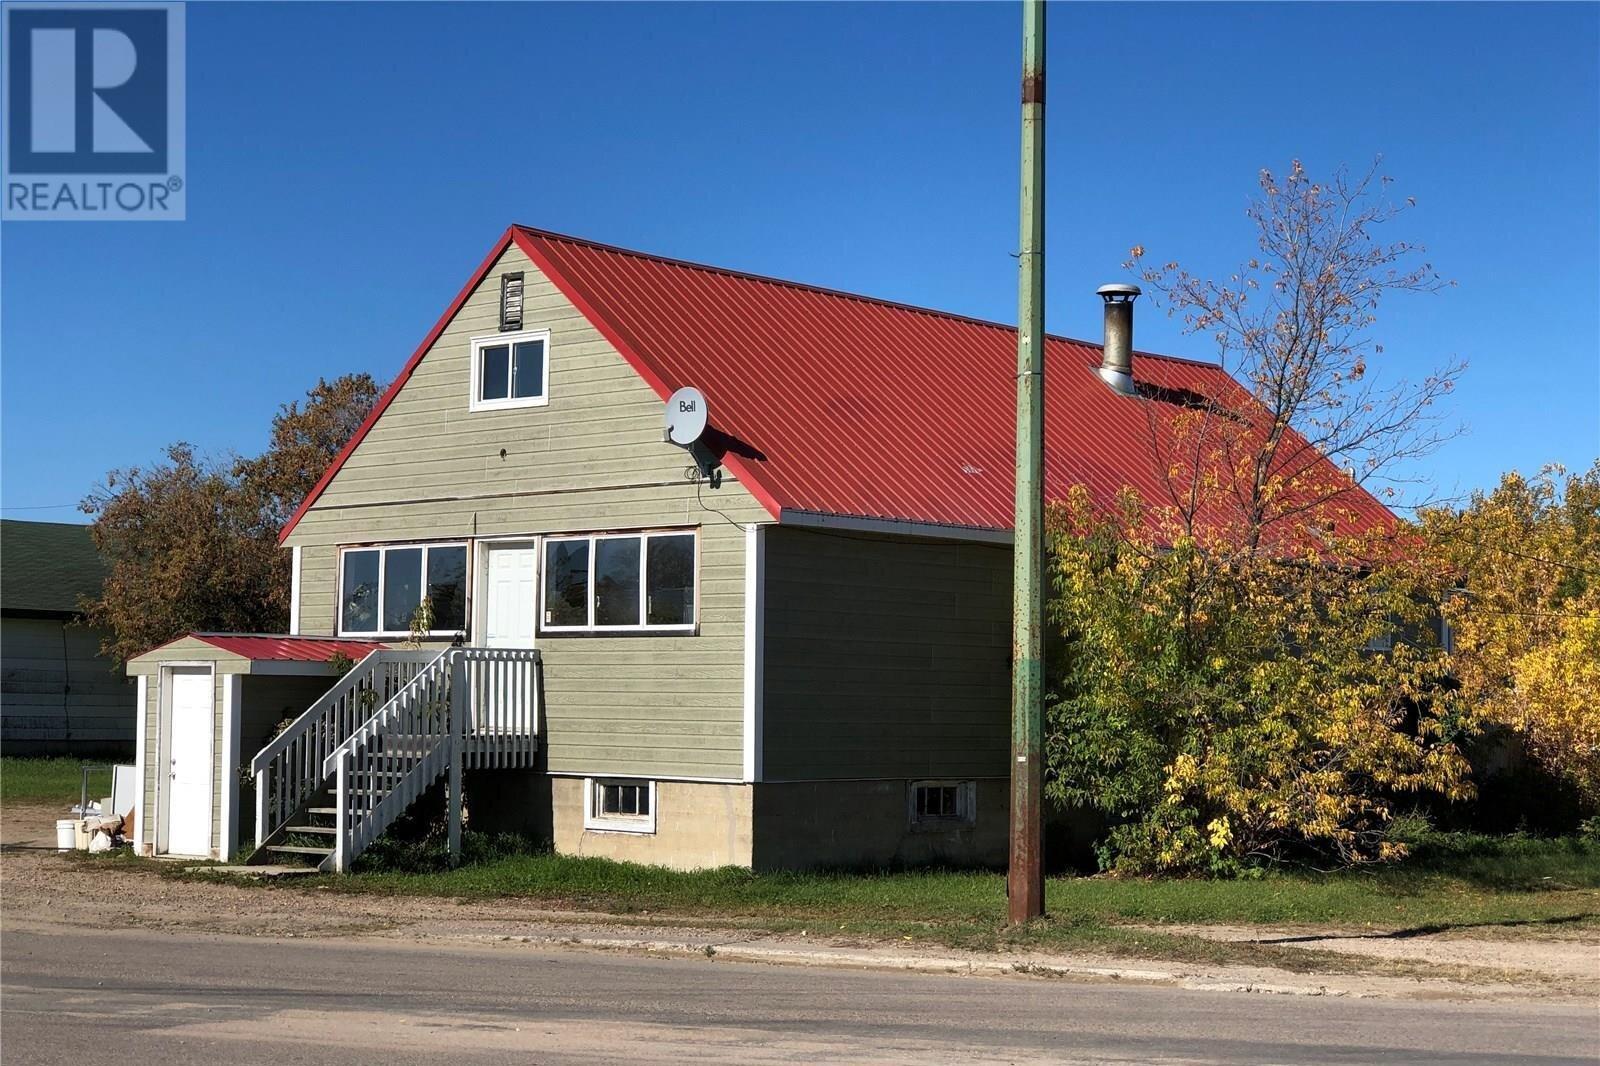 House for sale at 416 Buffalo St Buffalo Narrows Saskatchewan - MLS: SK831619